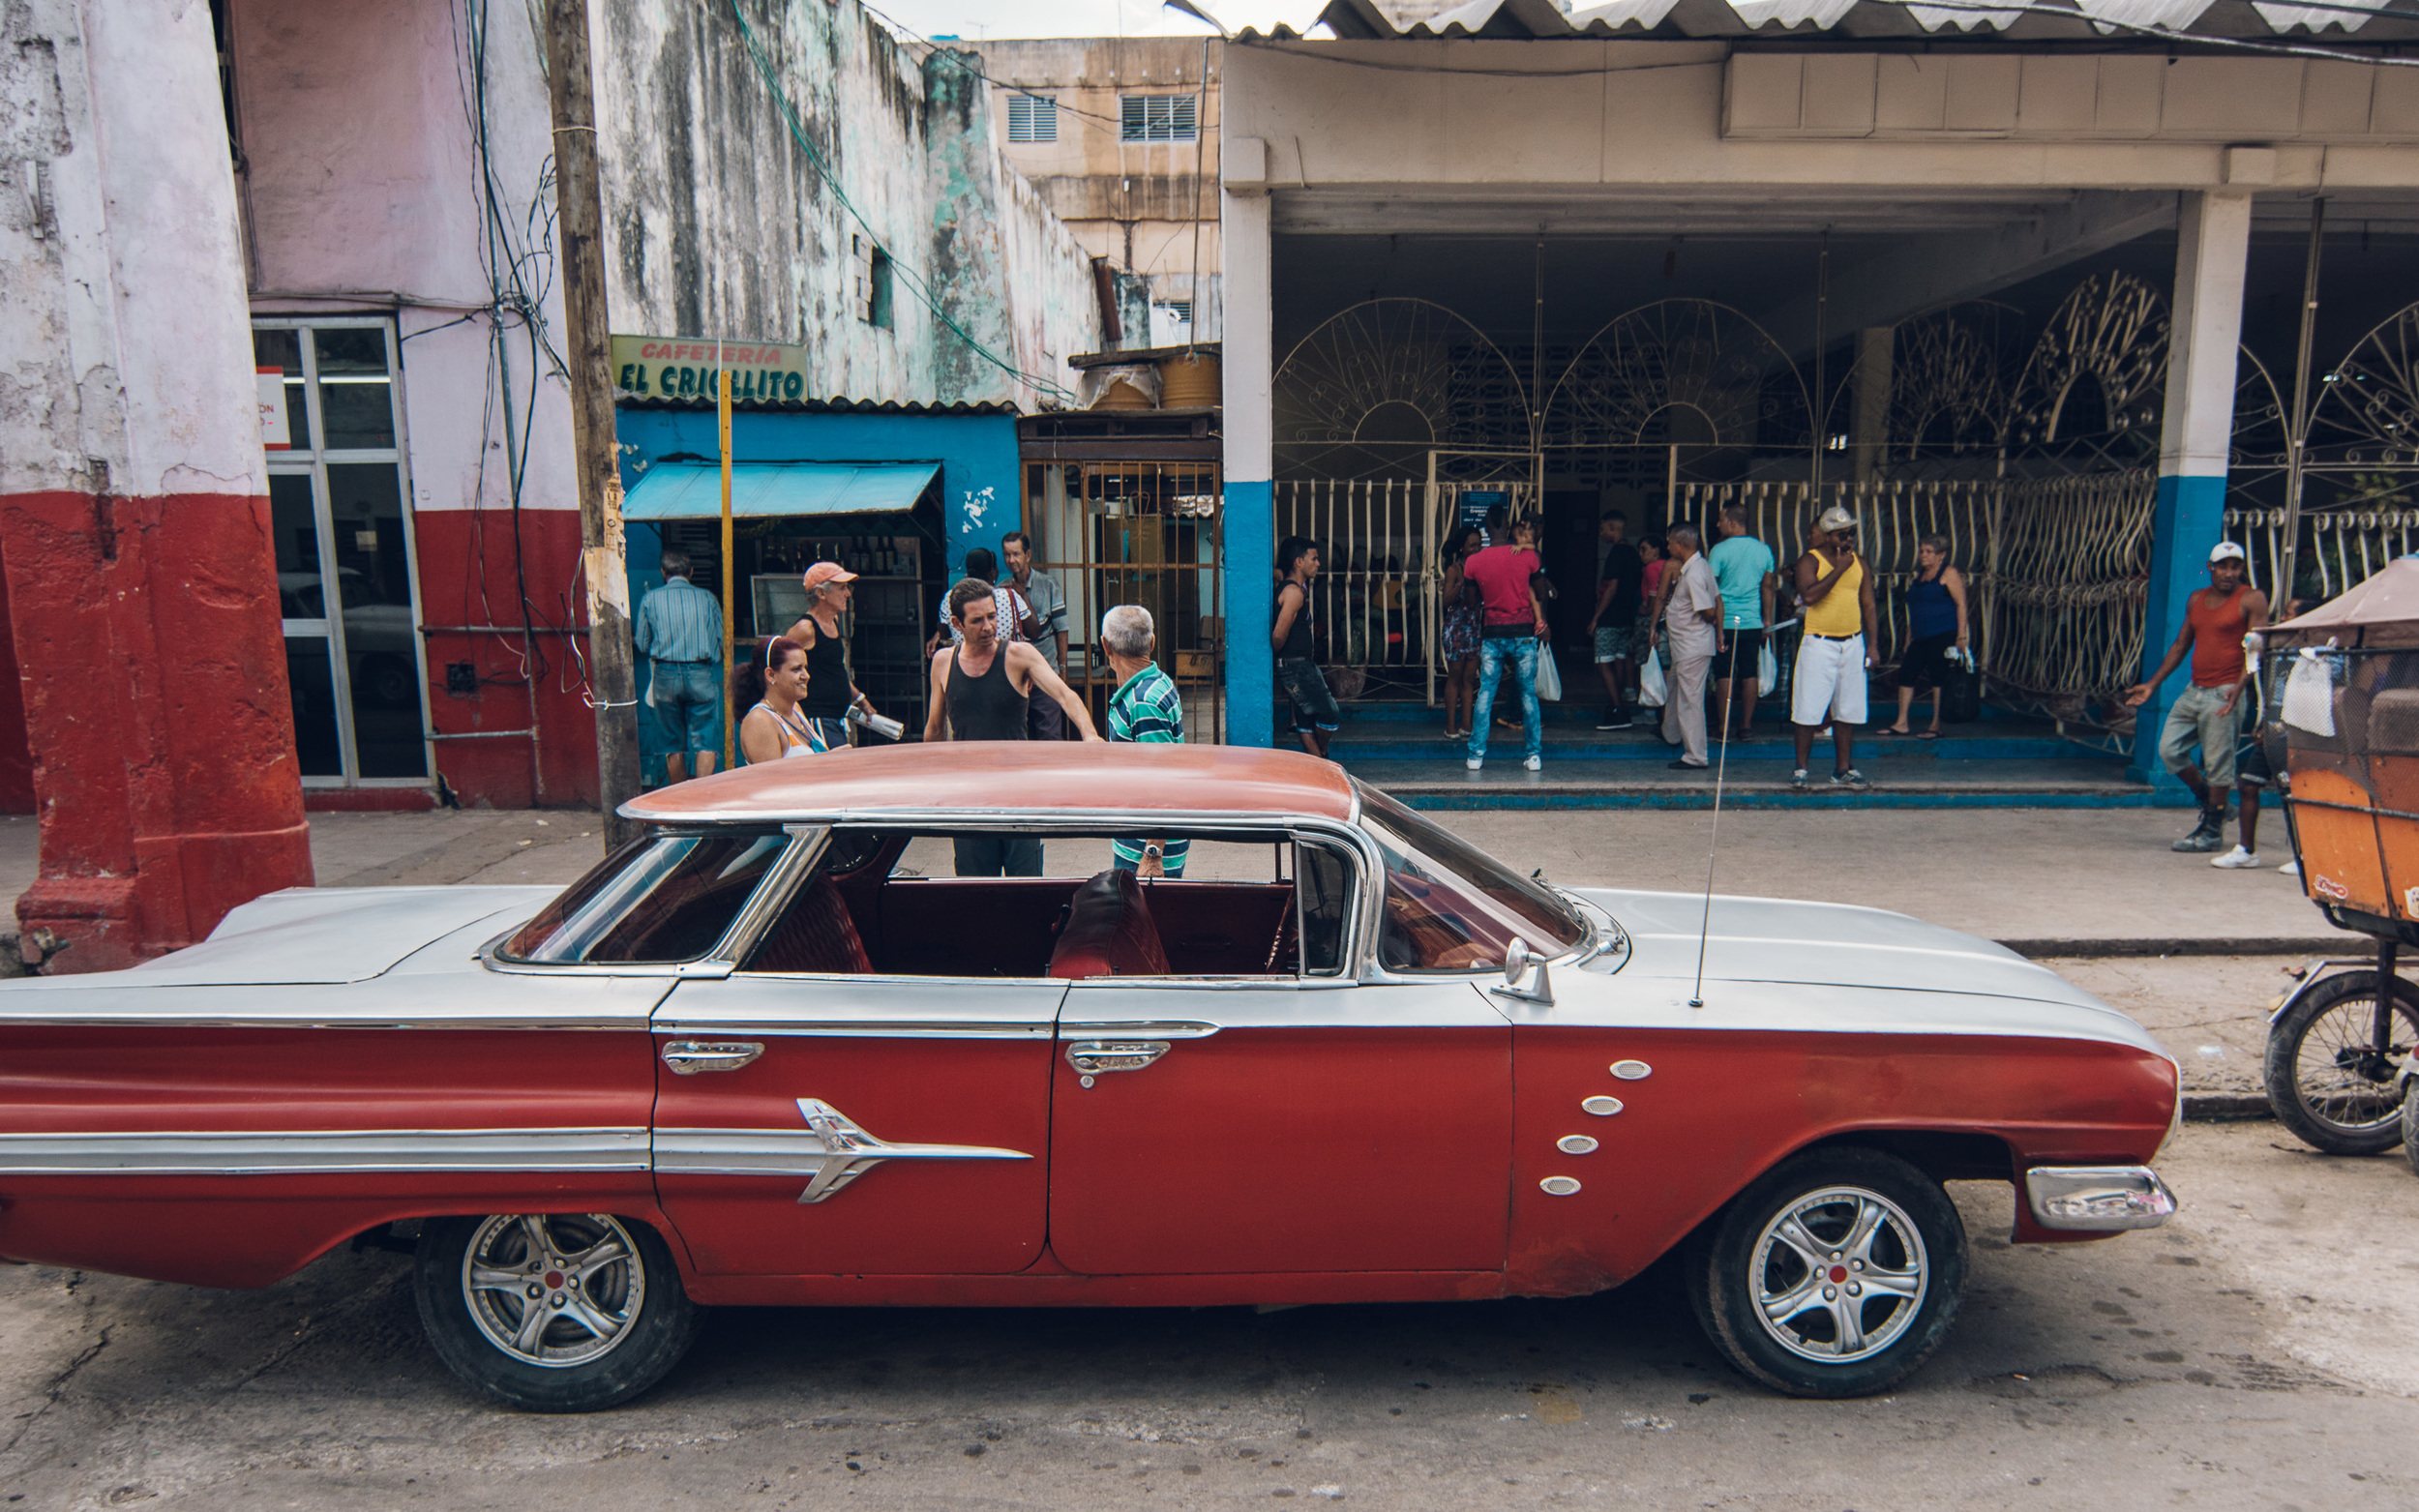 DeClaro-Photography-Cuba-02466.jpg